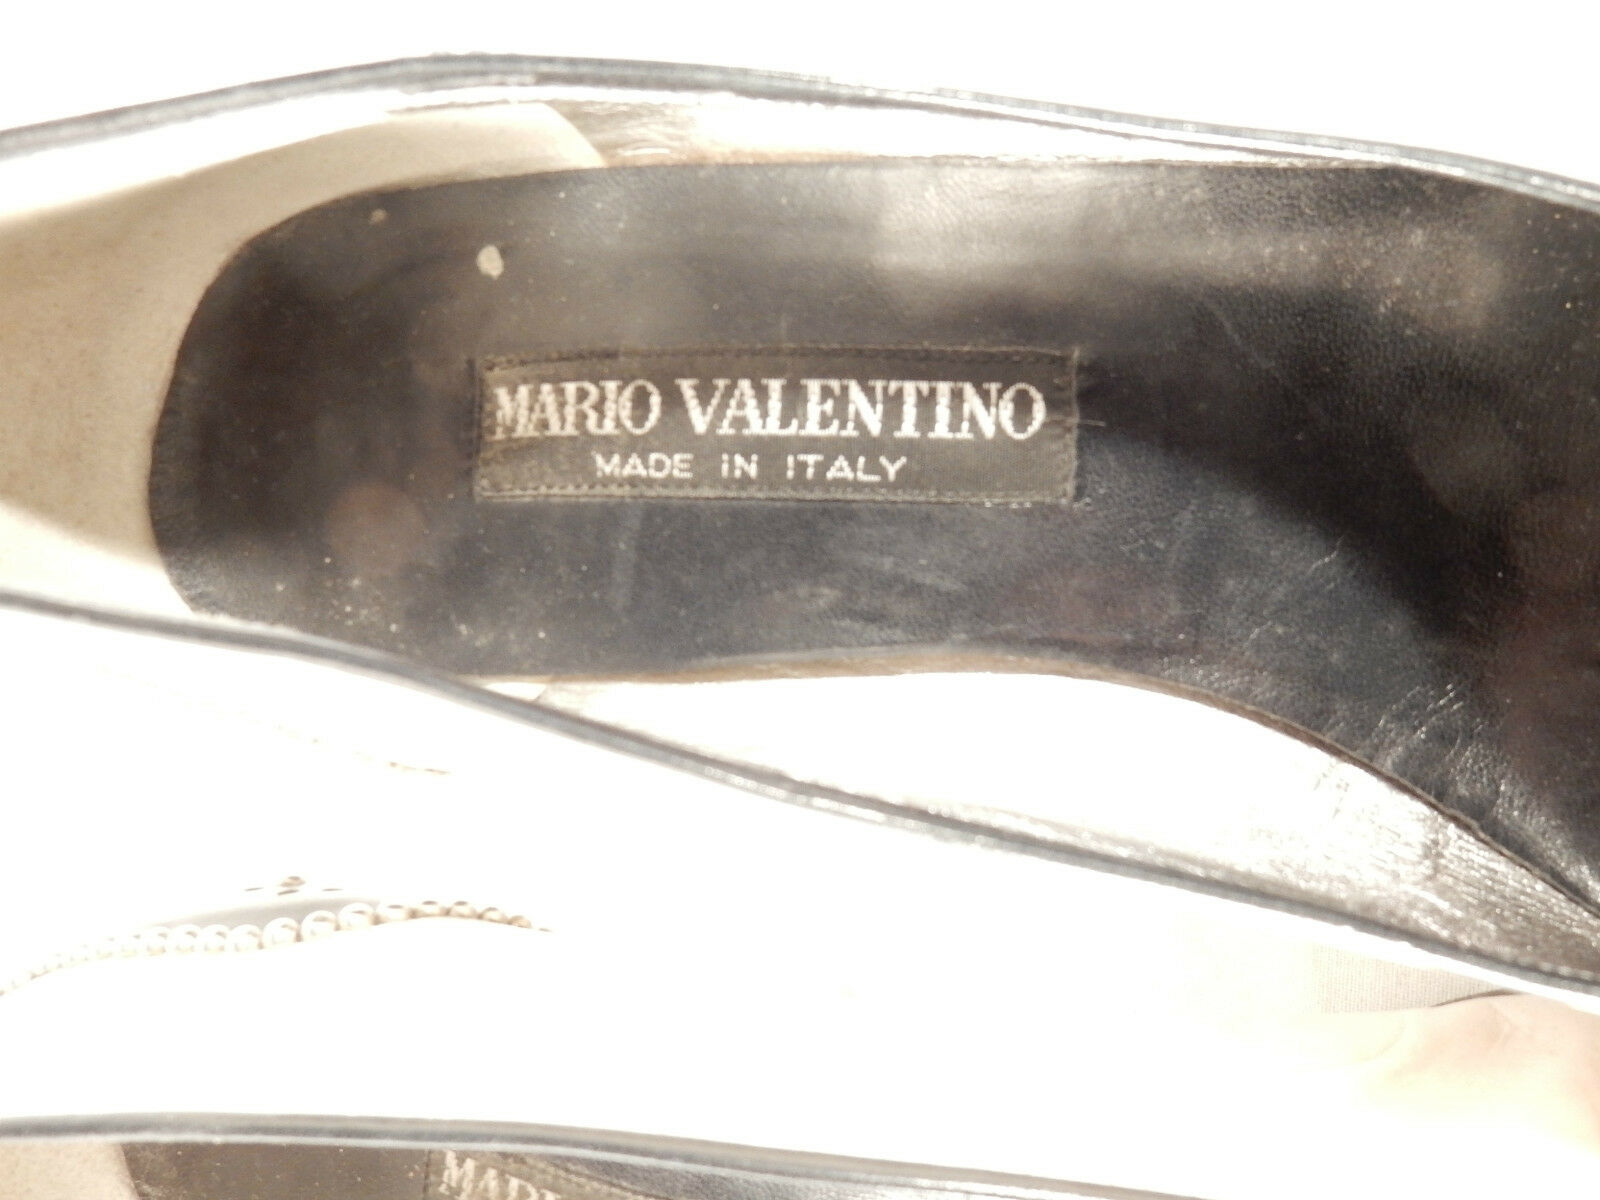 MARIO MARIO MARIO VALENTINO Pumps GR 38,5 Leder Made in  schwarz weiß a1a058